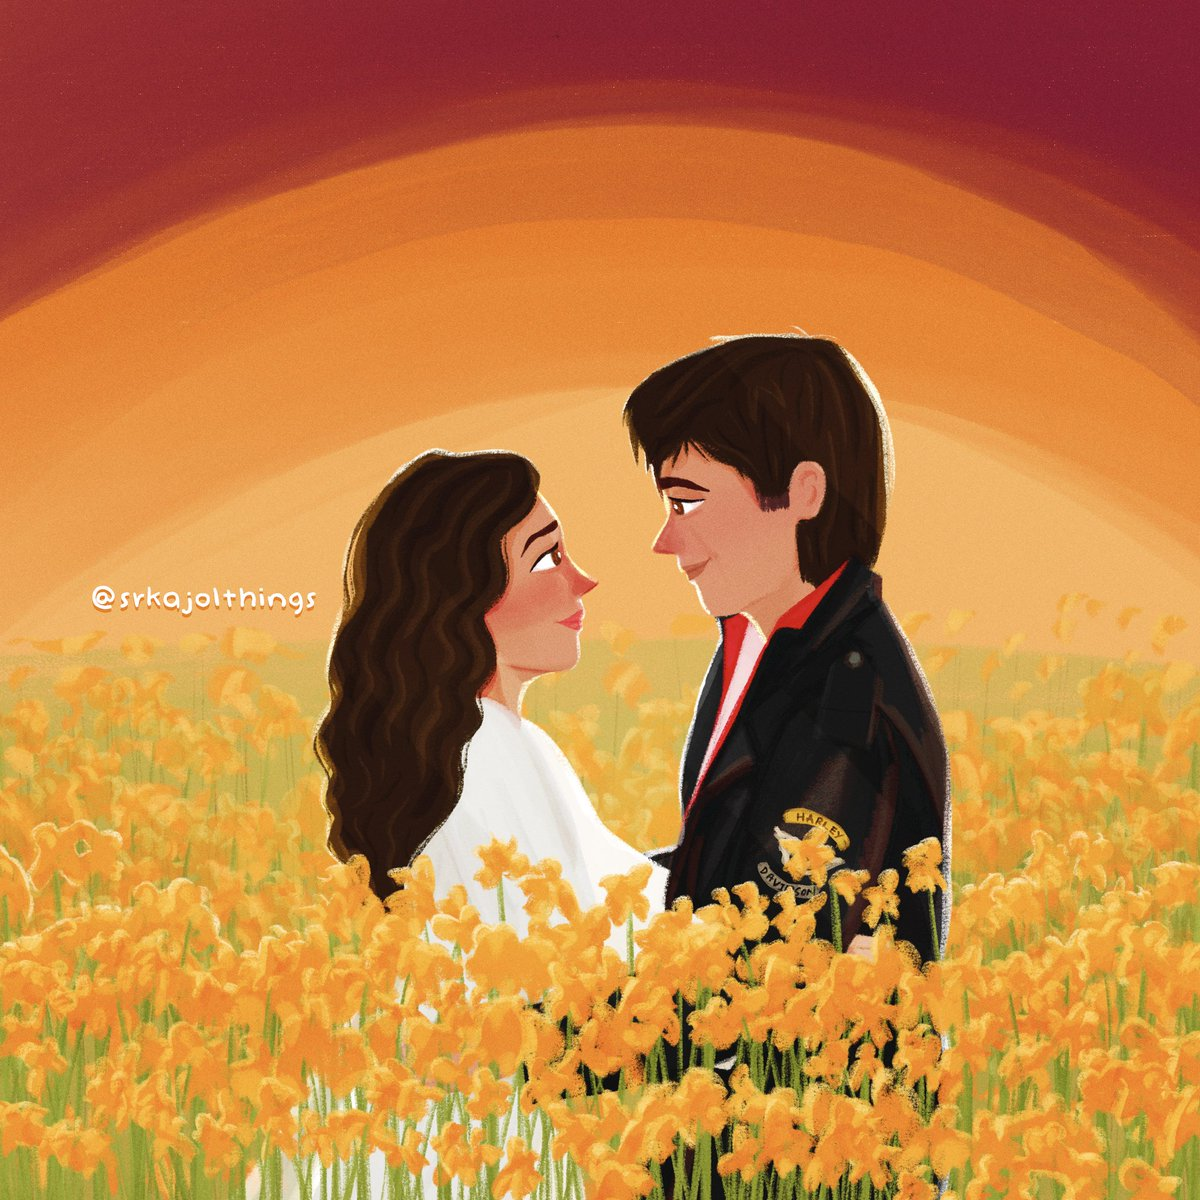 Tujhe dekha toh yeh jaana sanam. 💕  Hoping to complete 3 illustrations of Raj and Simran in celebration of DDLJ reaching 25 YEARS! I hope they have something planned. Ahem @yrf ahem. 🤣  #SRKajol #SRK #ShahRukhKhan #Kajol #KajolDevgan @itsKajolD @iamsrk  https://t.co/EVIK4lRINx https://t.co/YQfHZ9V3LA